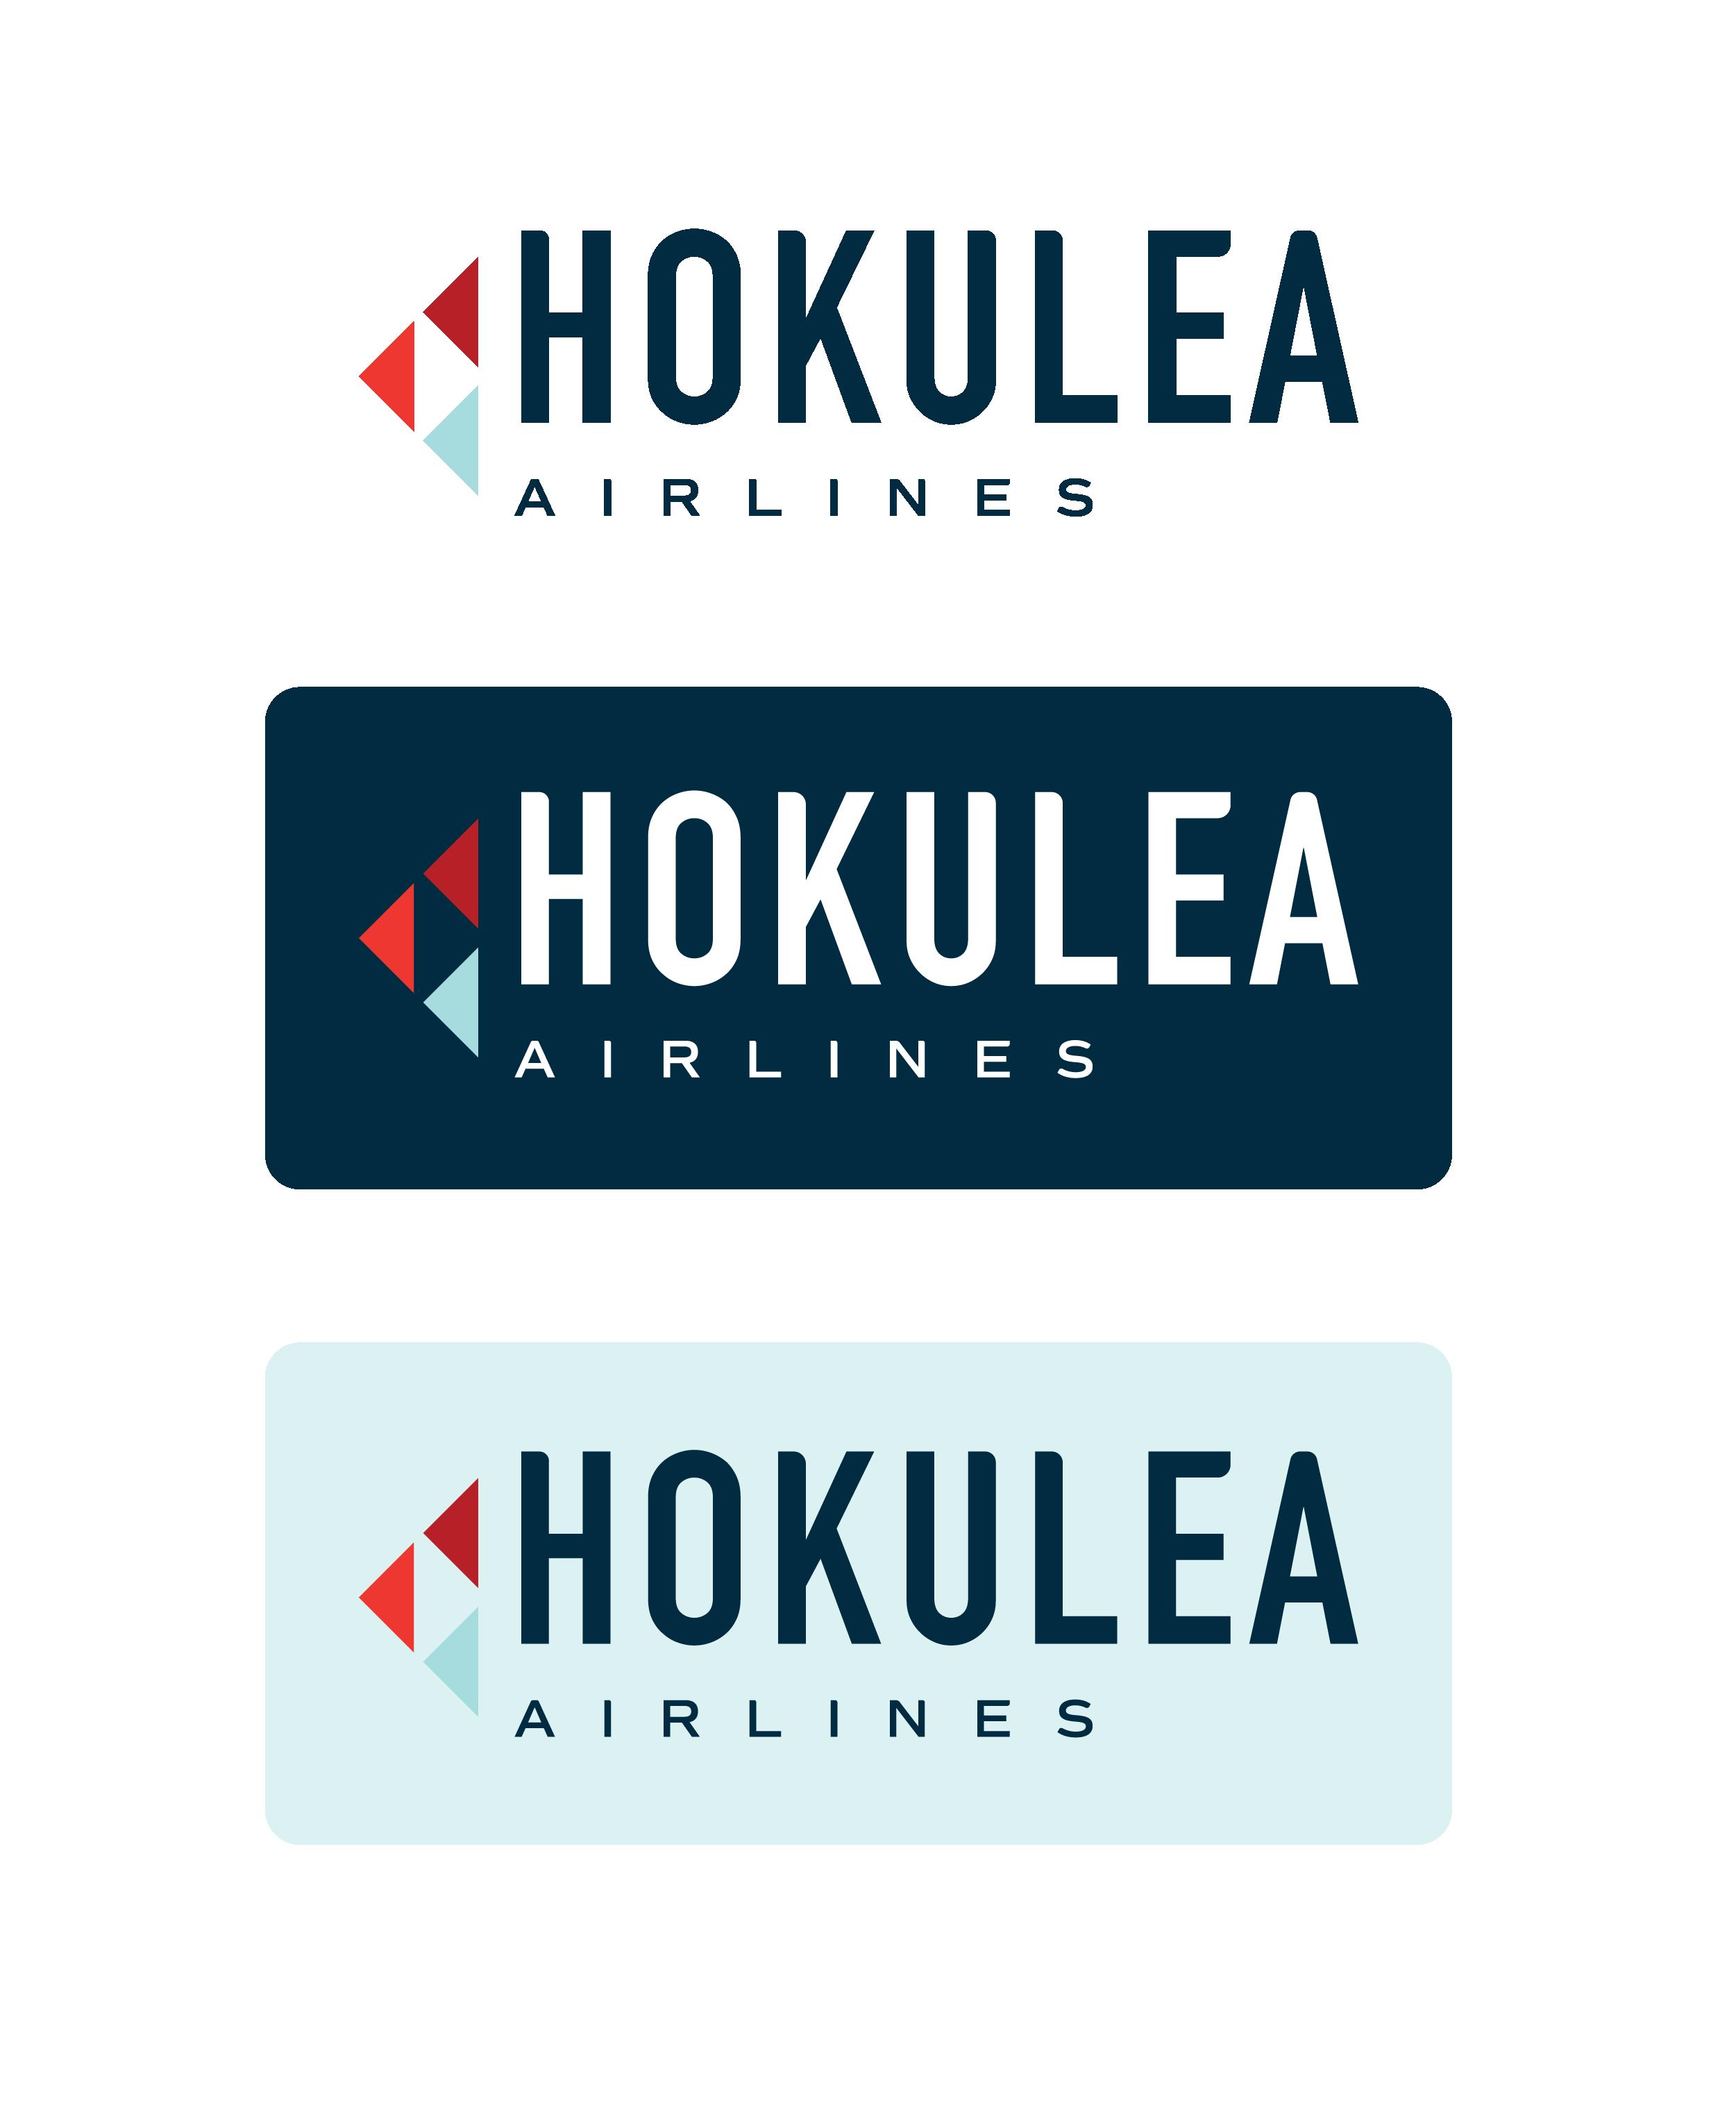 various styles of the hokulea logo